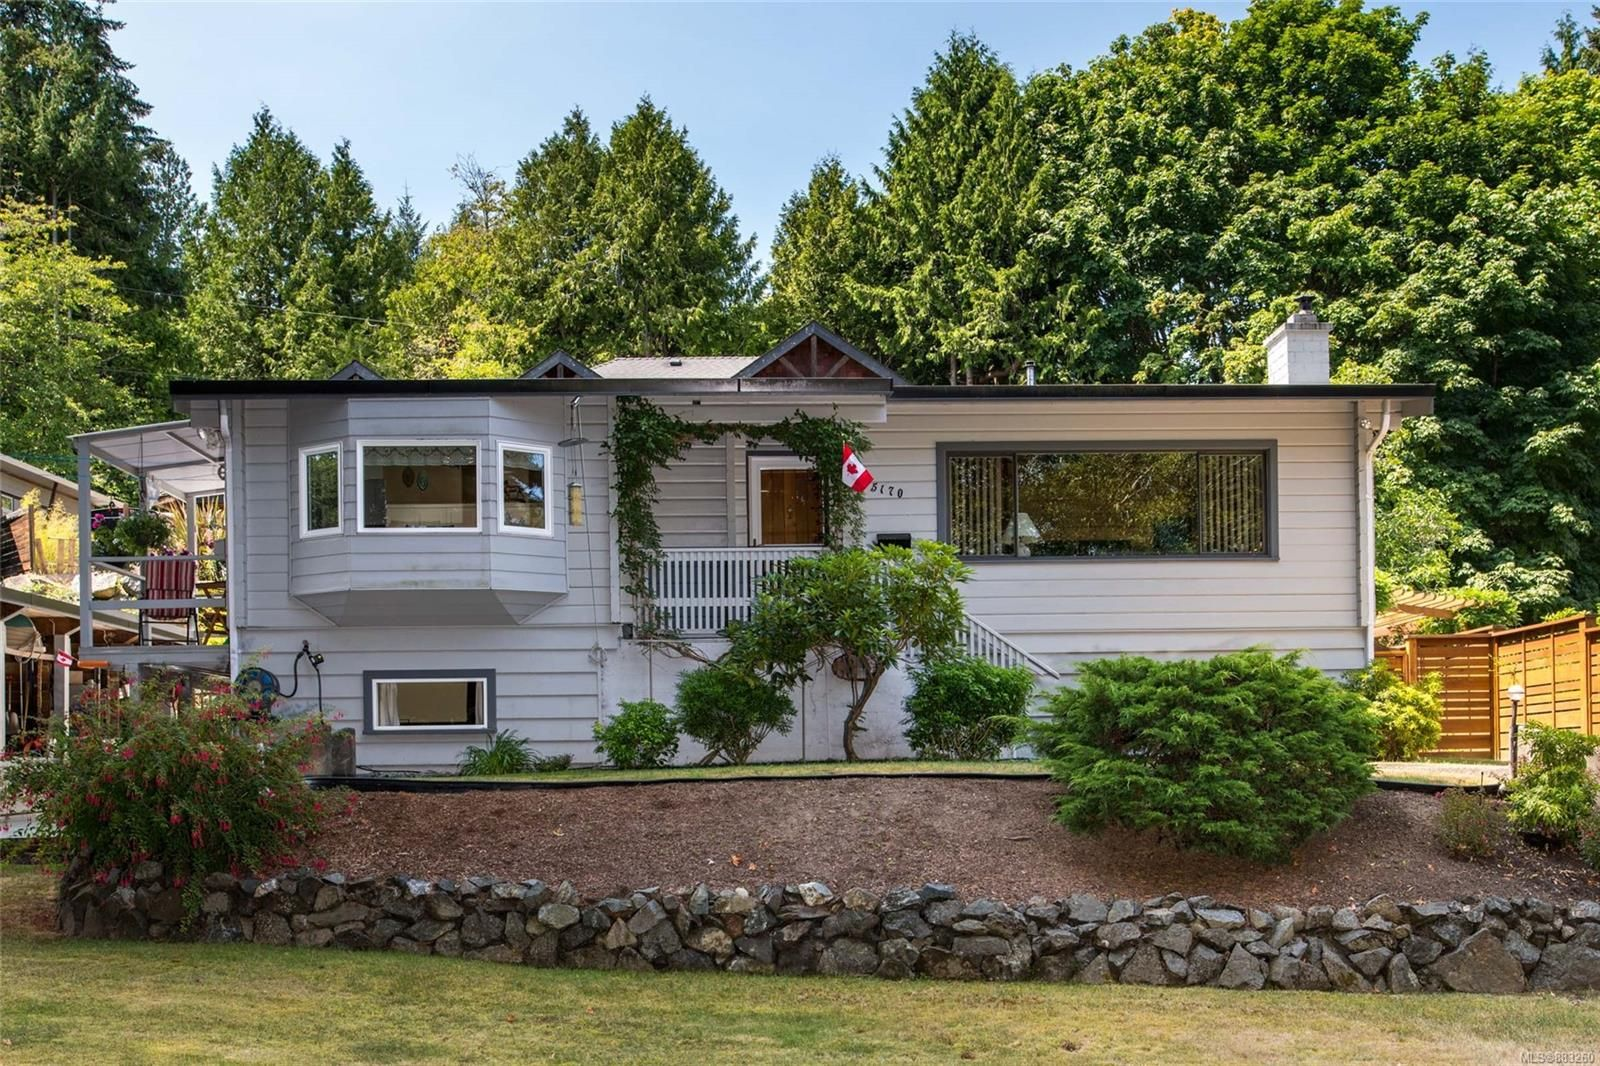 Main Photo: 5170 Rambler Rd in : SE Cordova Bay House for sale (Saanich East)  : MLS®# 883260